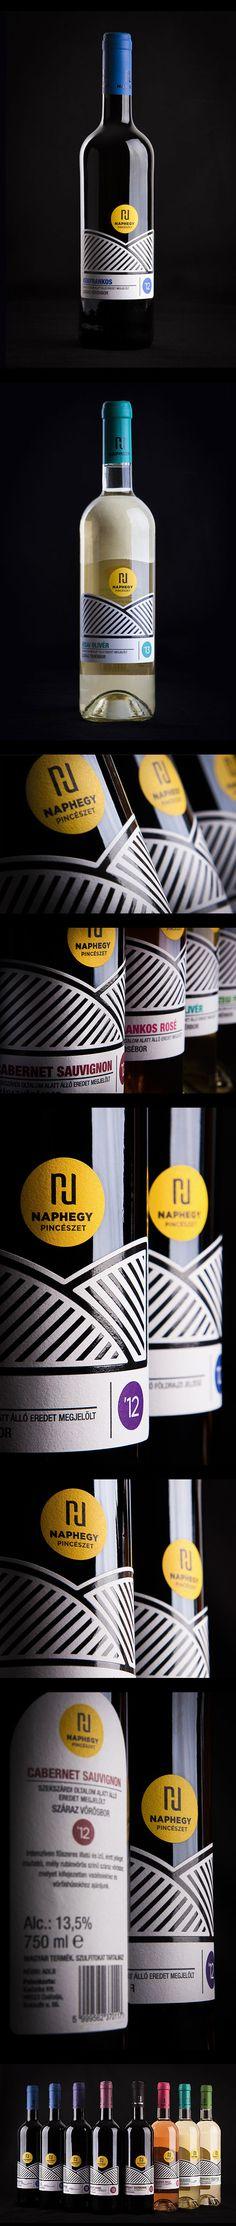 Expanded pin Naphegy Pincészet | Sunhill Winery by Tamás Csility PD